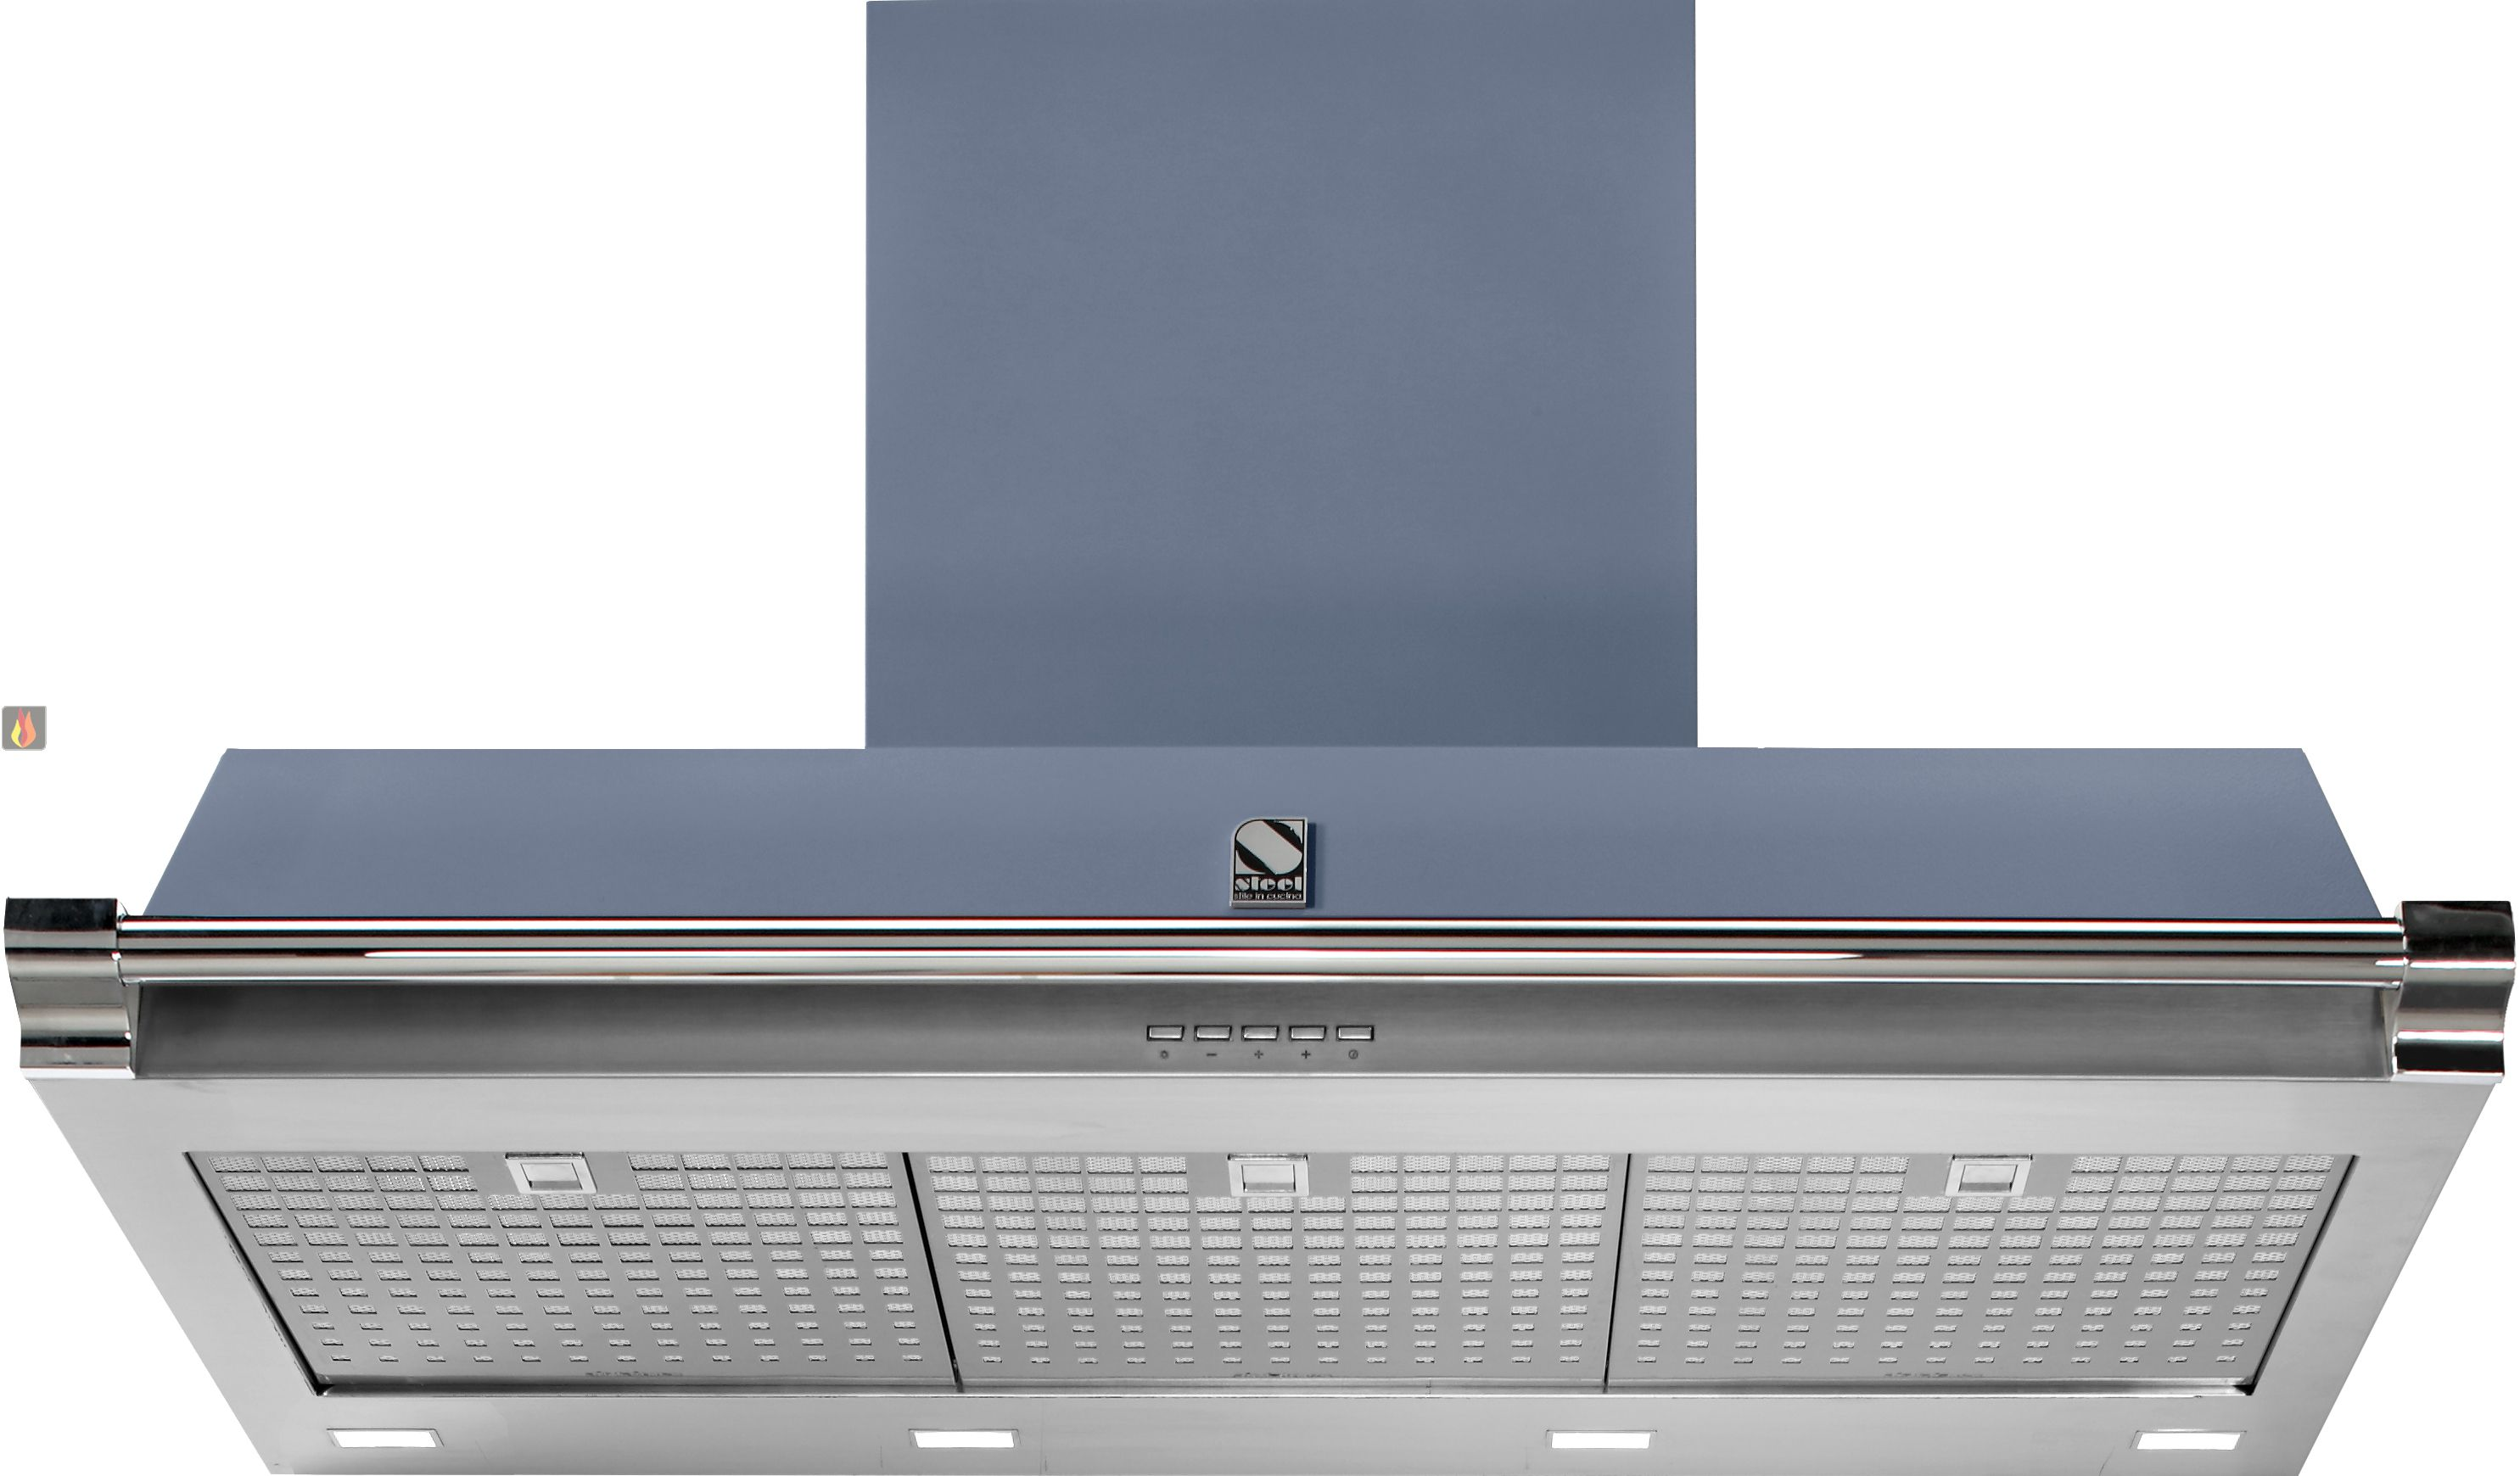 hotte d corative murale avec clairage halog ne ajustable en hauteur steel cucine ec ste406. Black Bedroom Furniture Sets. Home Design Ideas